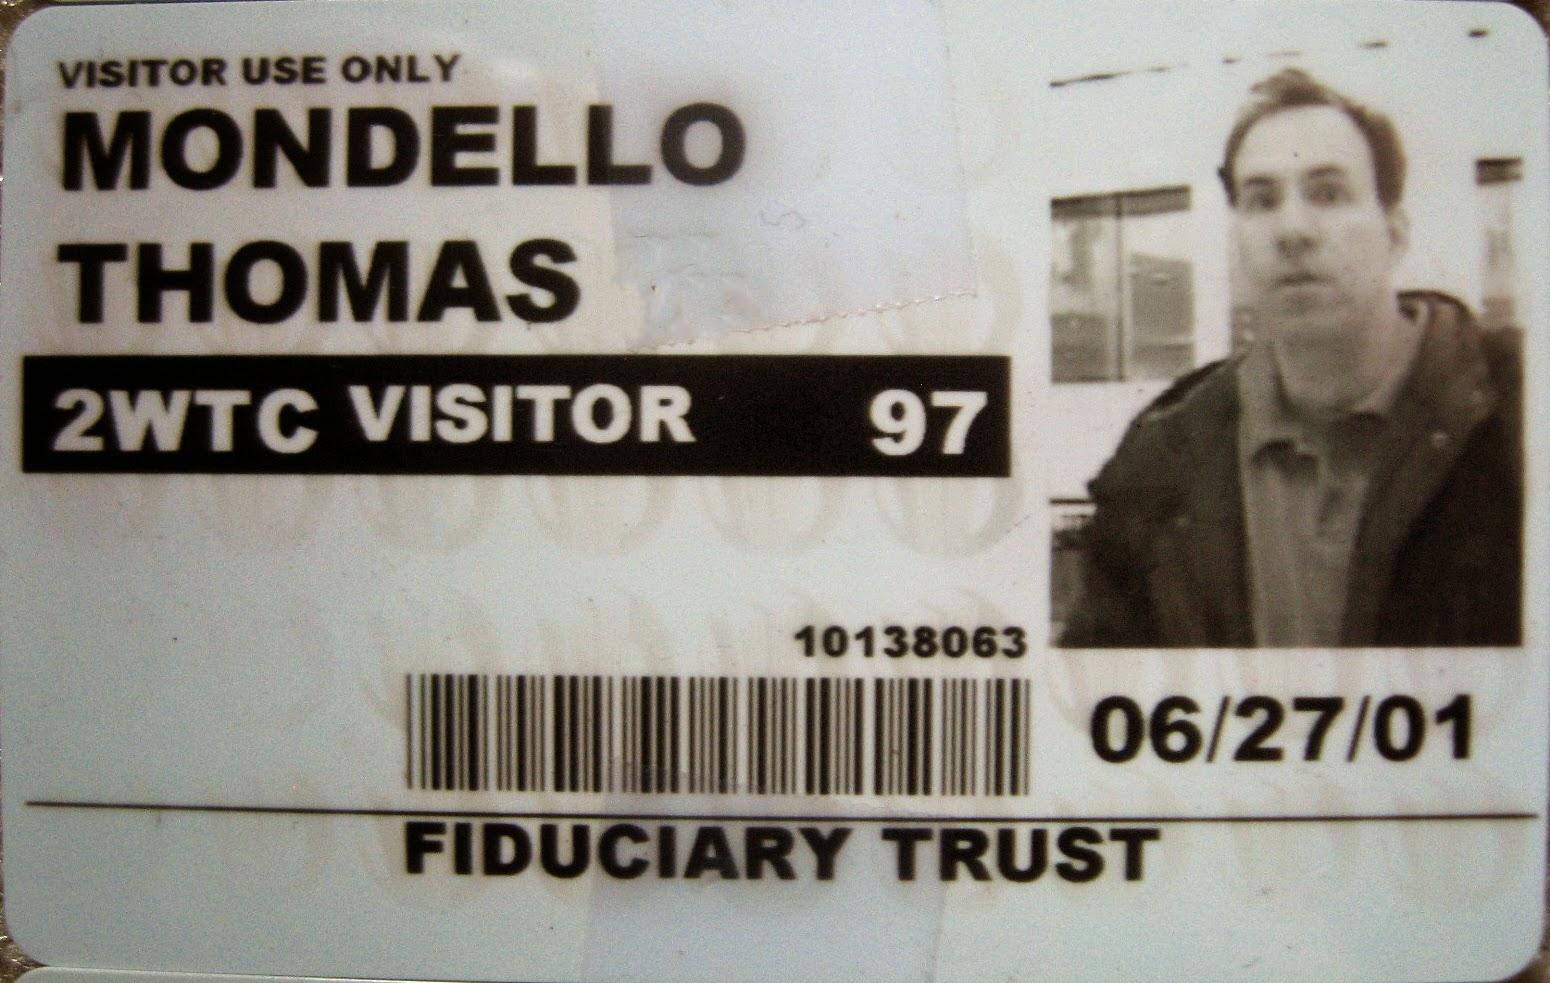 Tommy Mondello World Trade Center pass June 27, 2001